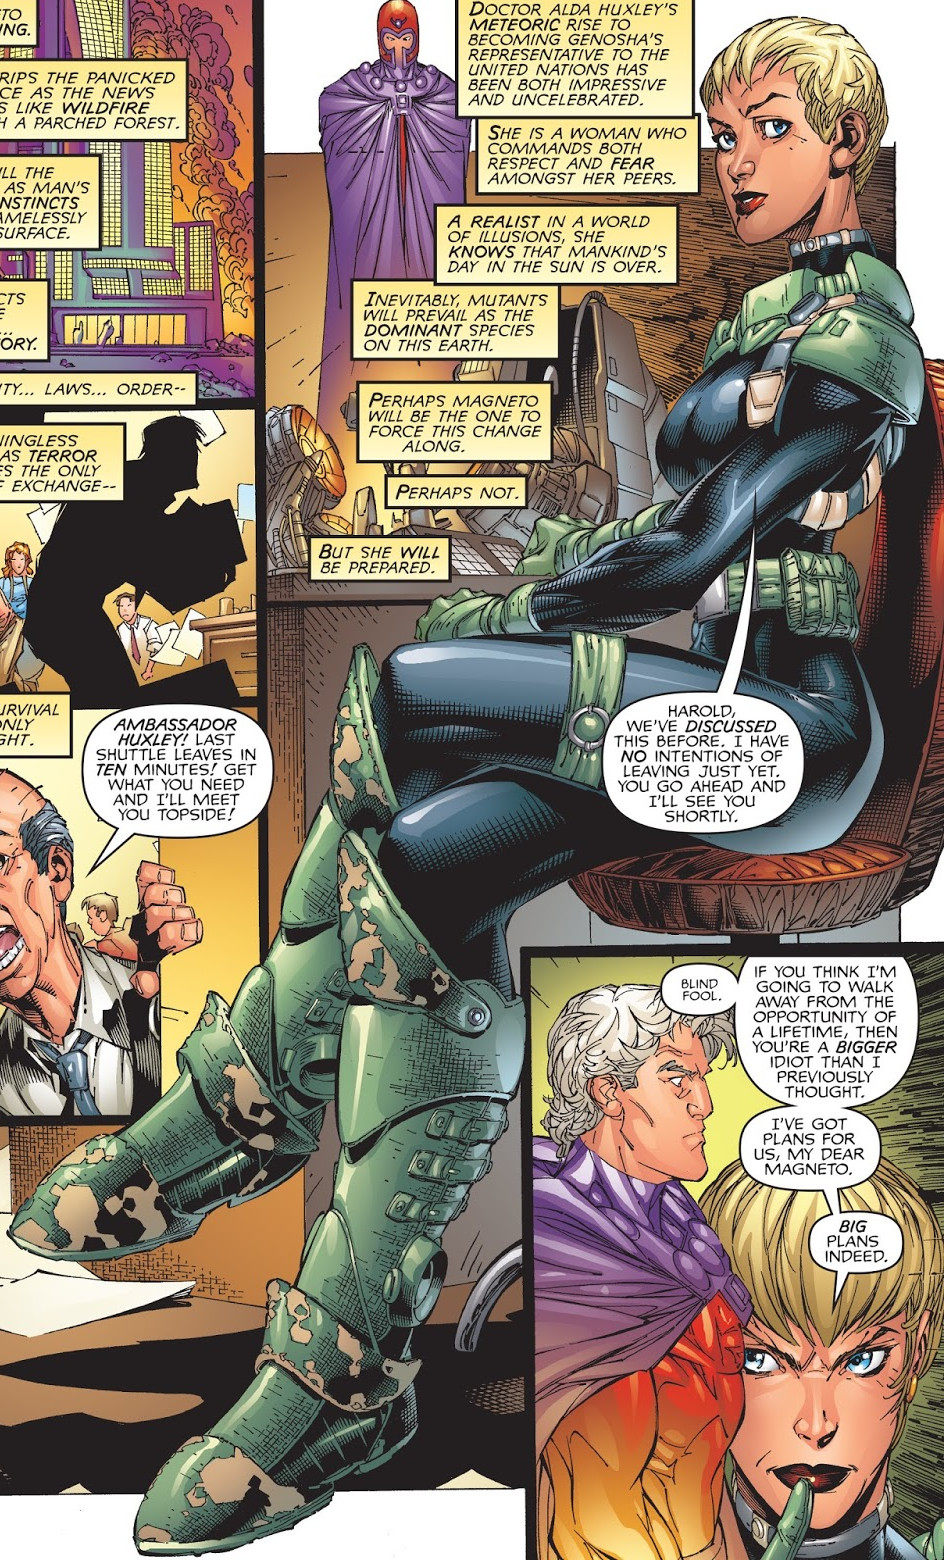 Alda Huxley (Earth-616)